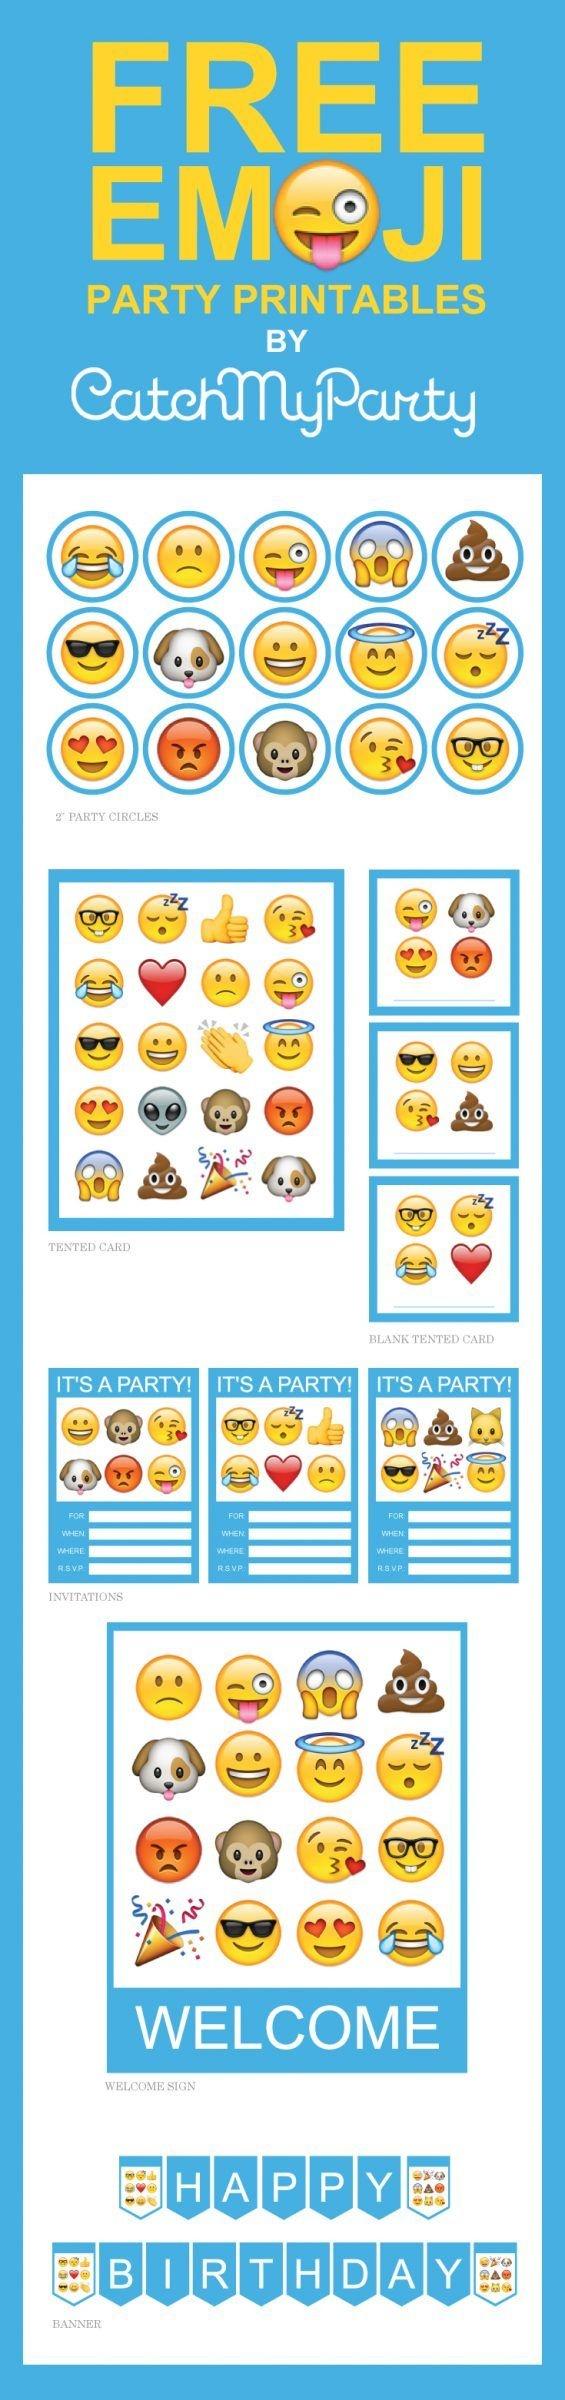 Free Emoji Party Printables Including Invitations, Cupcake Toppers - Free Emoji Party Printables